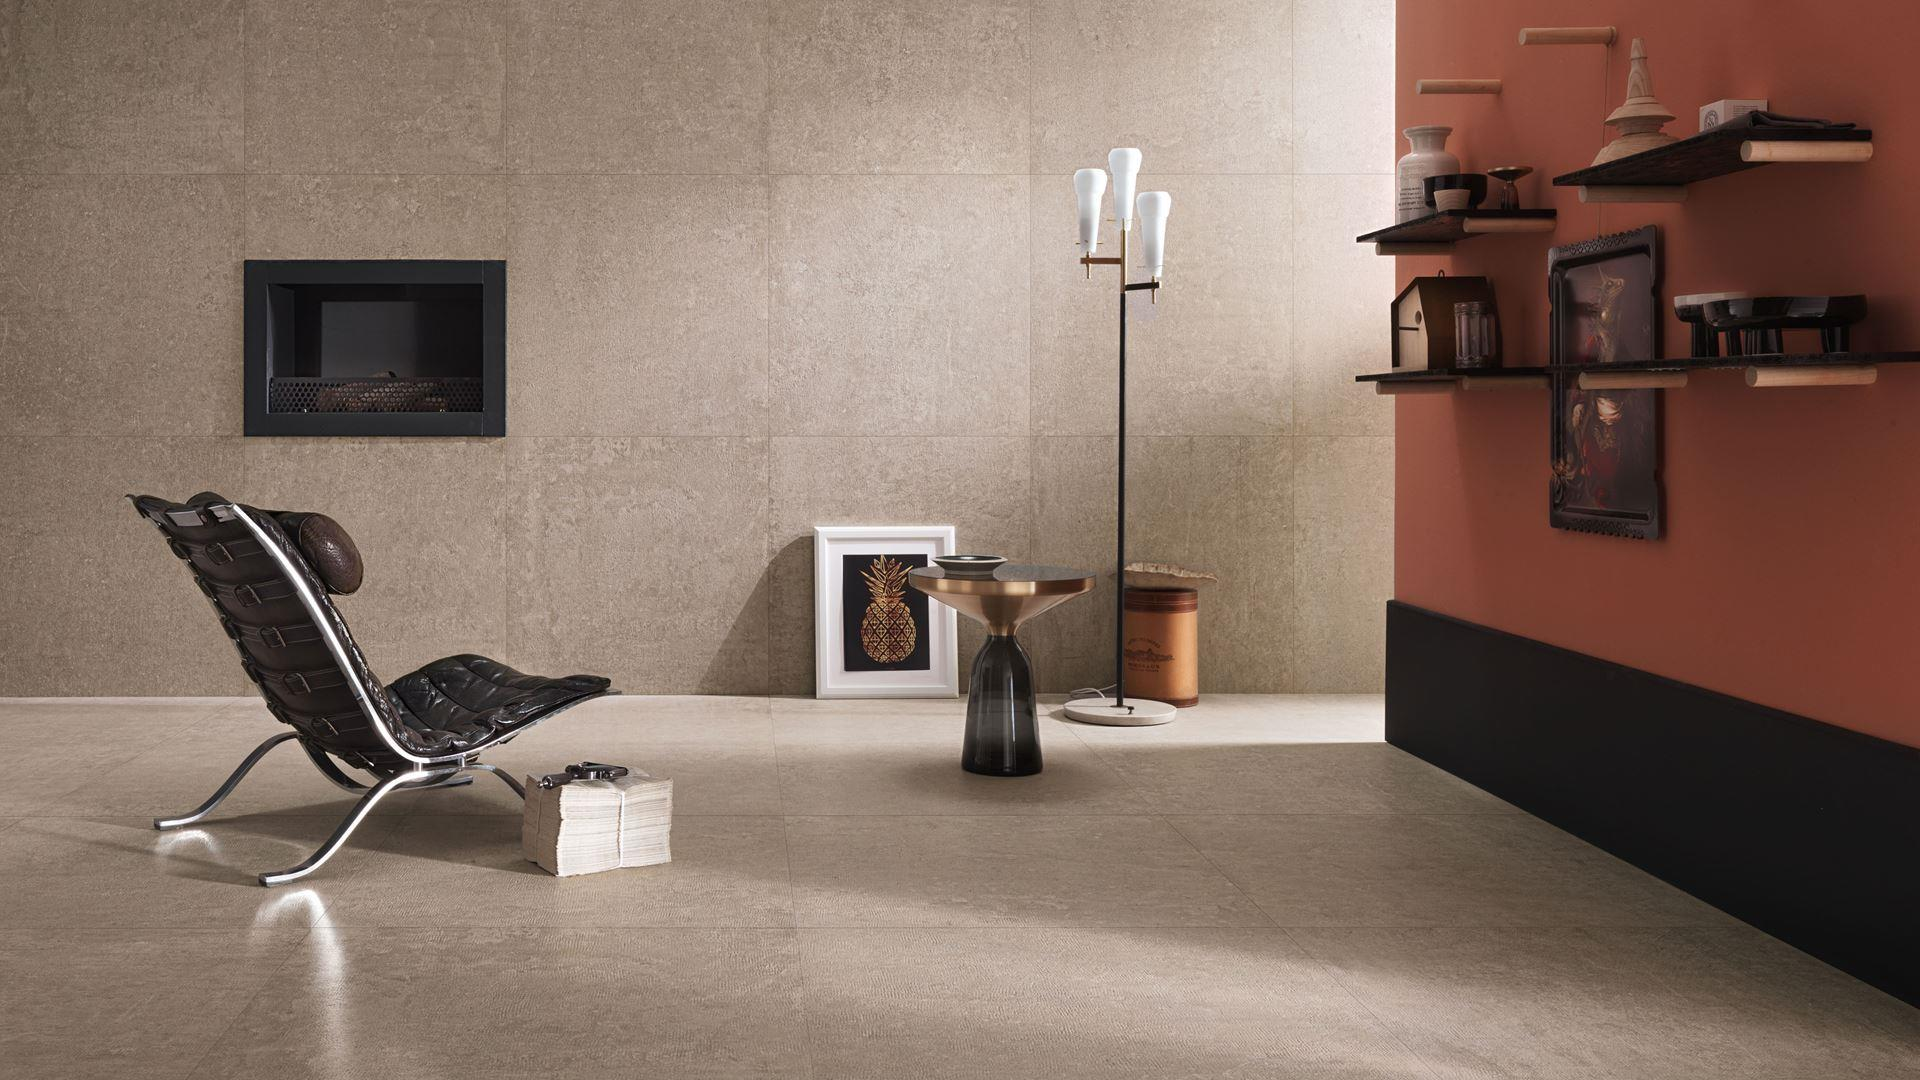 X Beton Collection Cotto Deste Flooring And Cladding